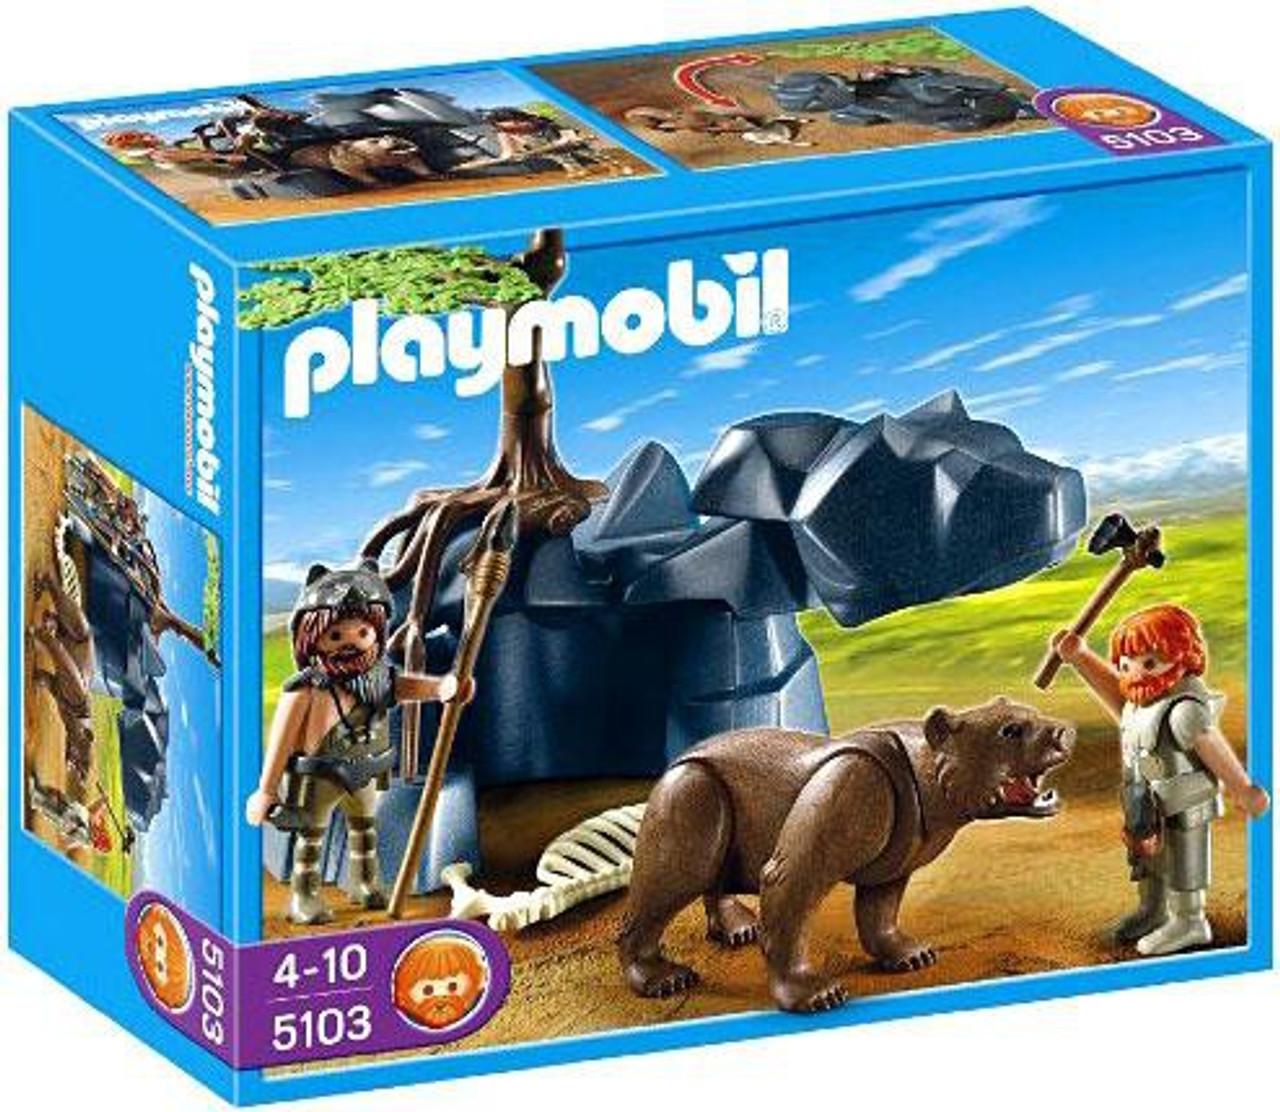 Playmobil Stone Age Bear with Cavemen Set #5103